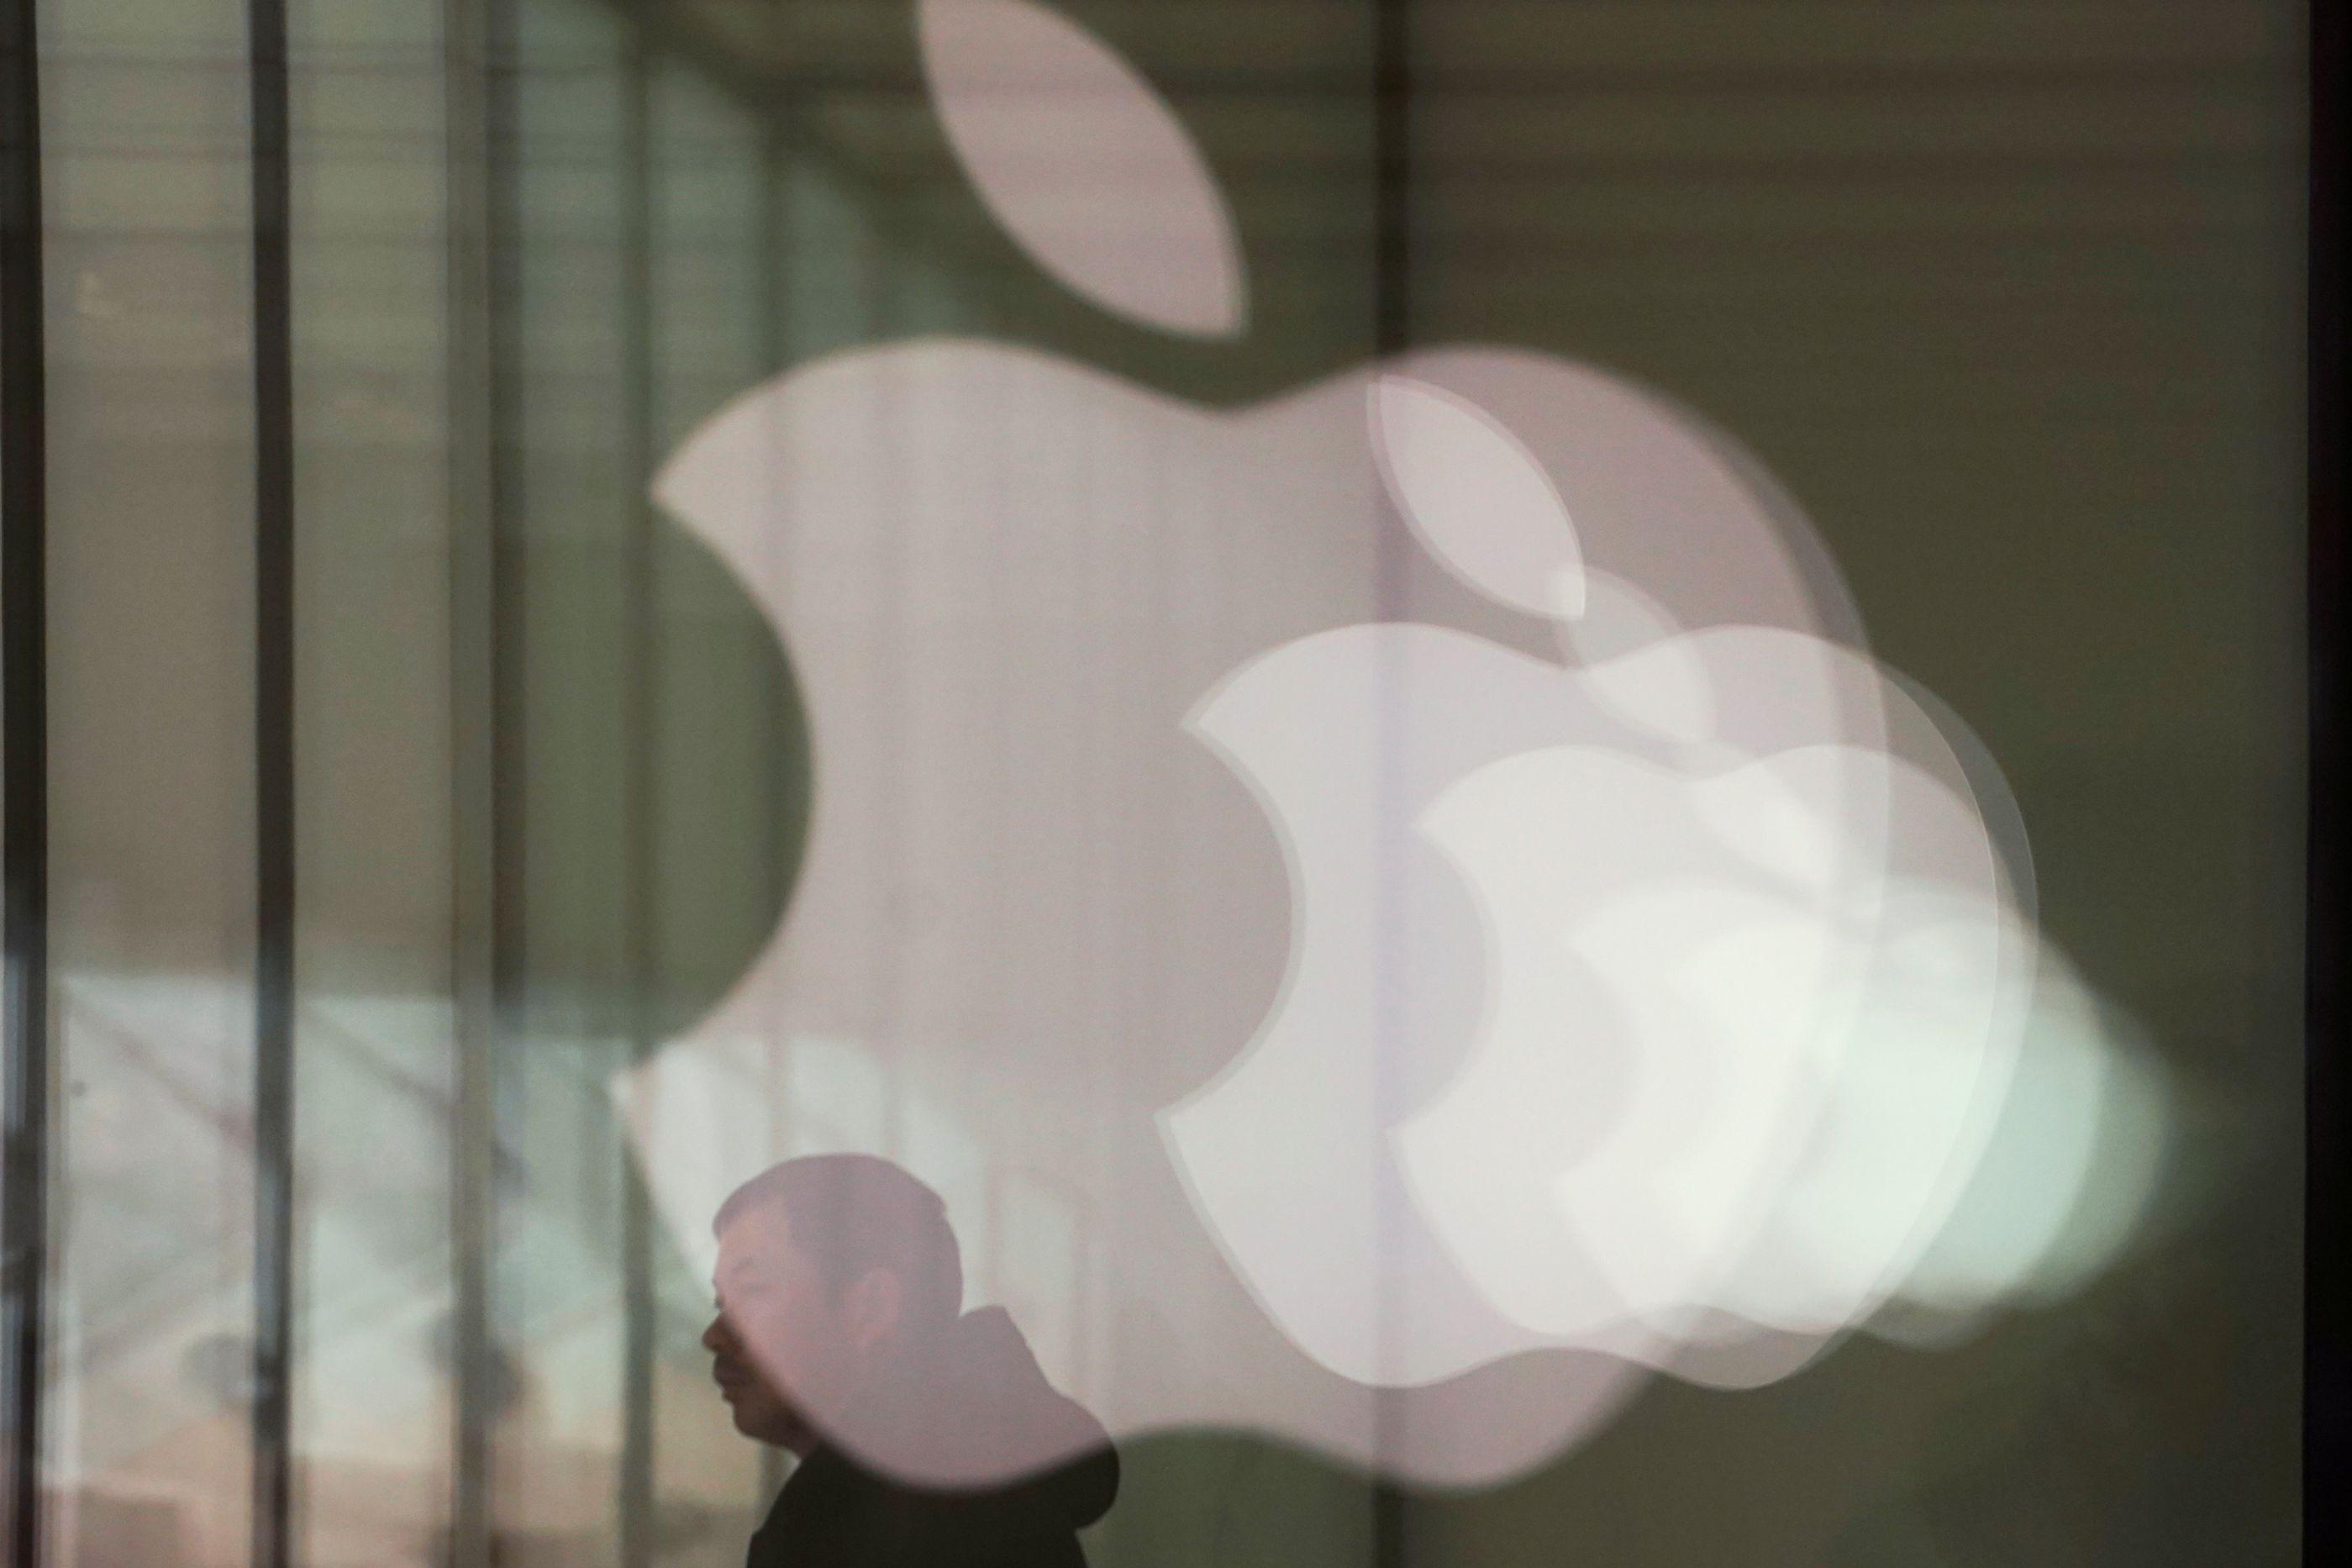 Apple corrige erro do FaceTime que permitia 'espionar' usuários